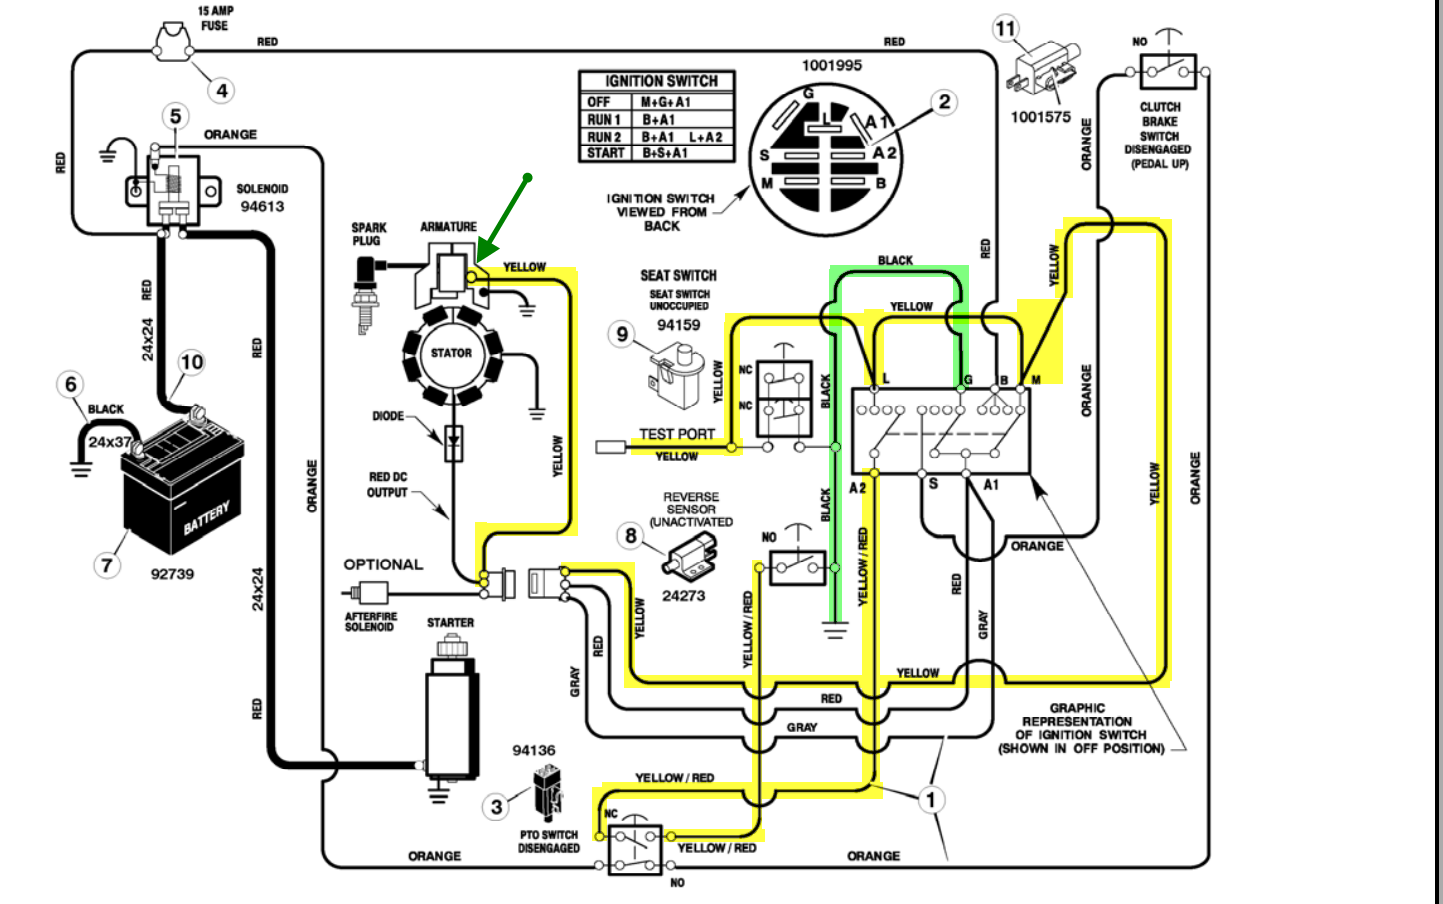 medium resolution of 19 hp briggs and stratton wiring diagram diagrams schematics best of